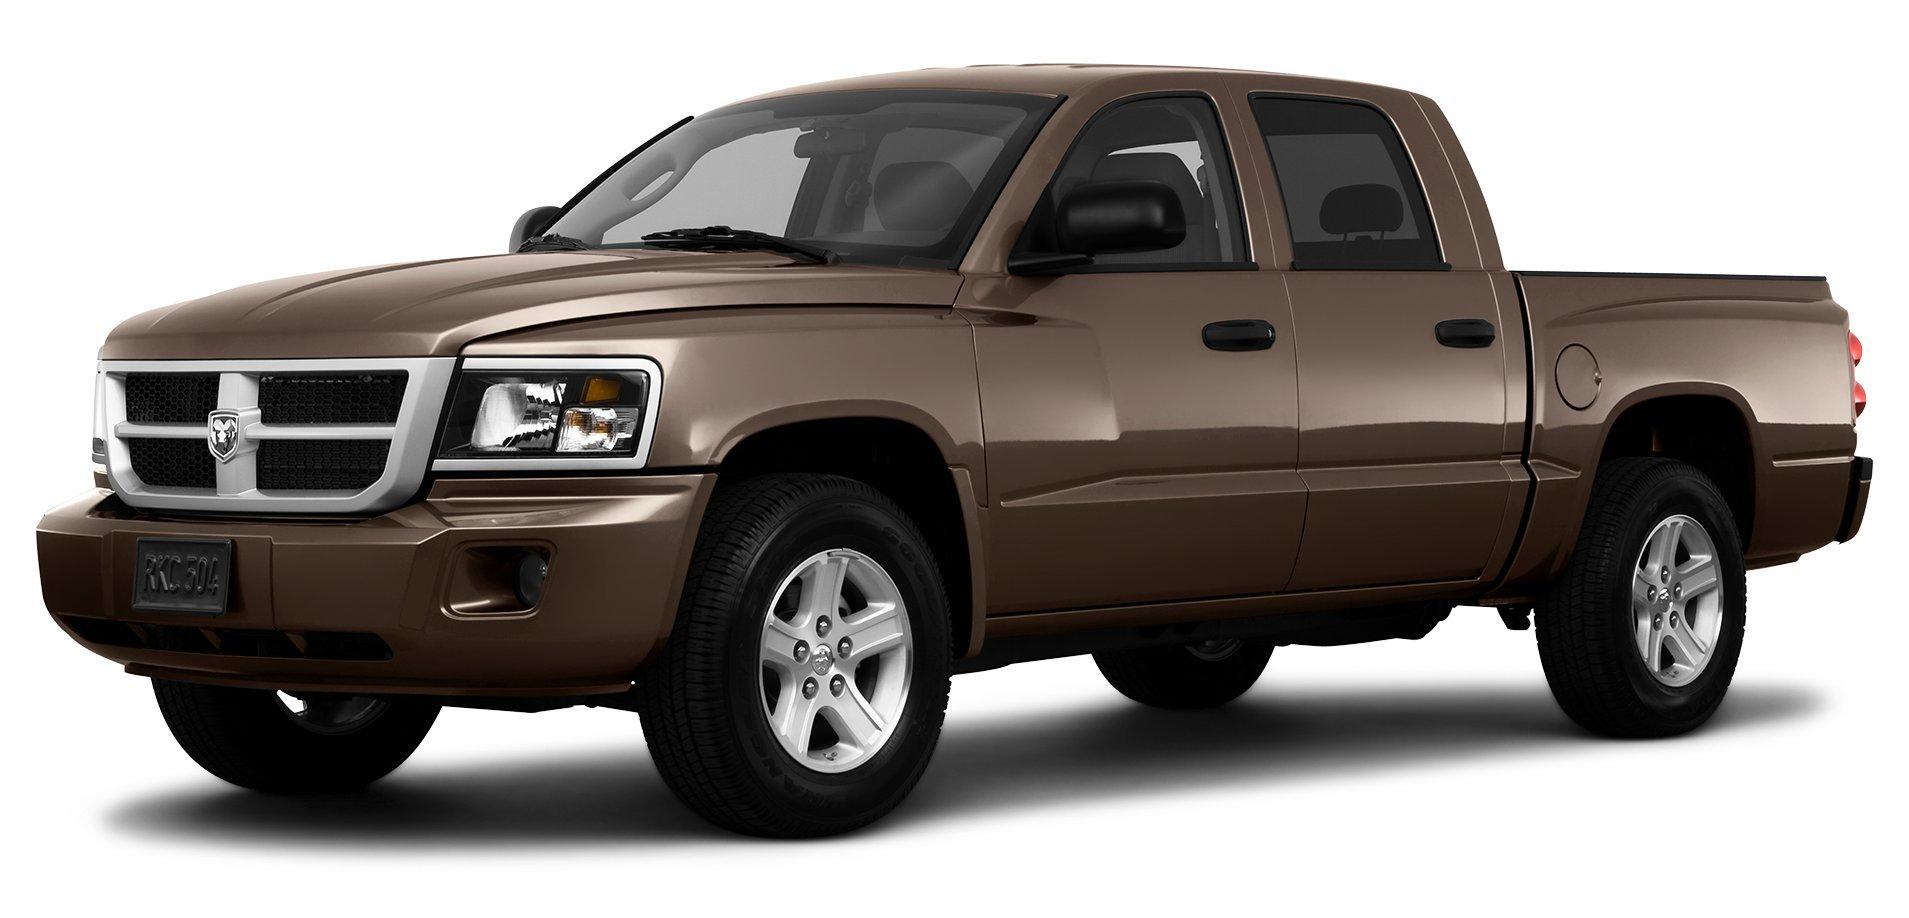 2010 Dodge Dakota Bighorn/Lonestar, 2-Wheel Drive Crew Cab ...